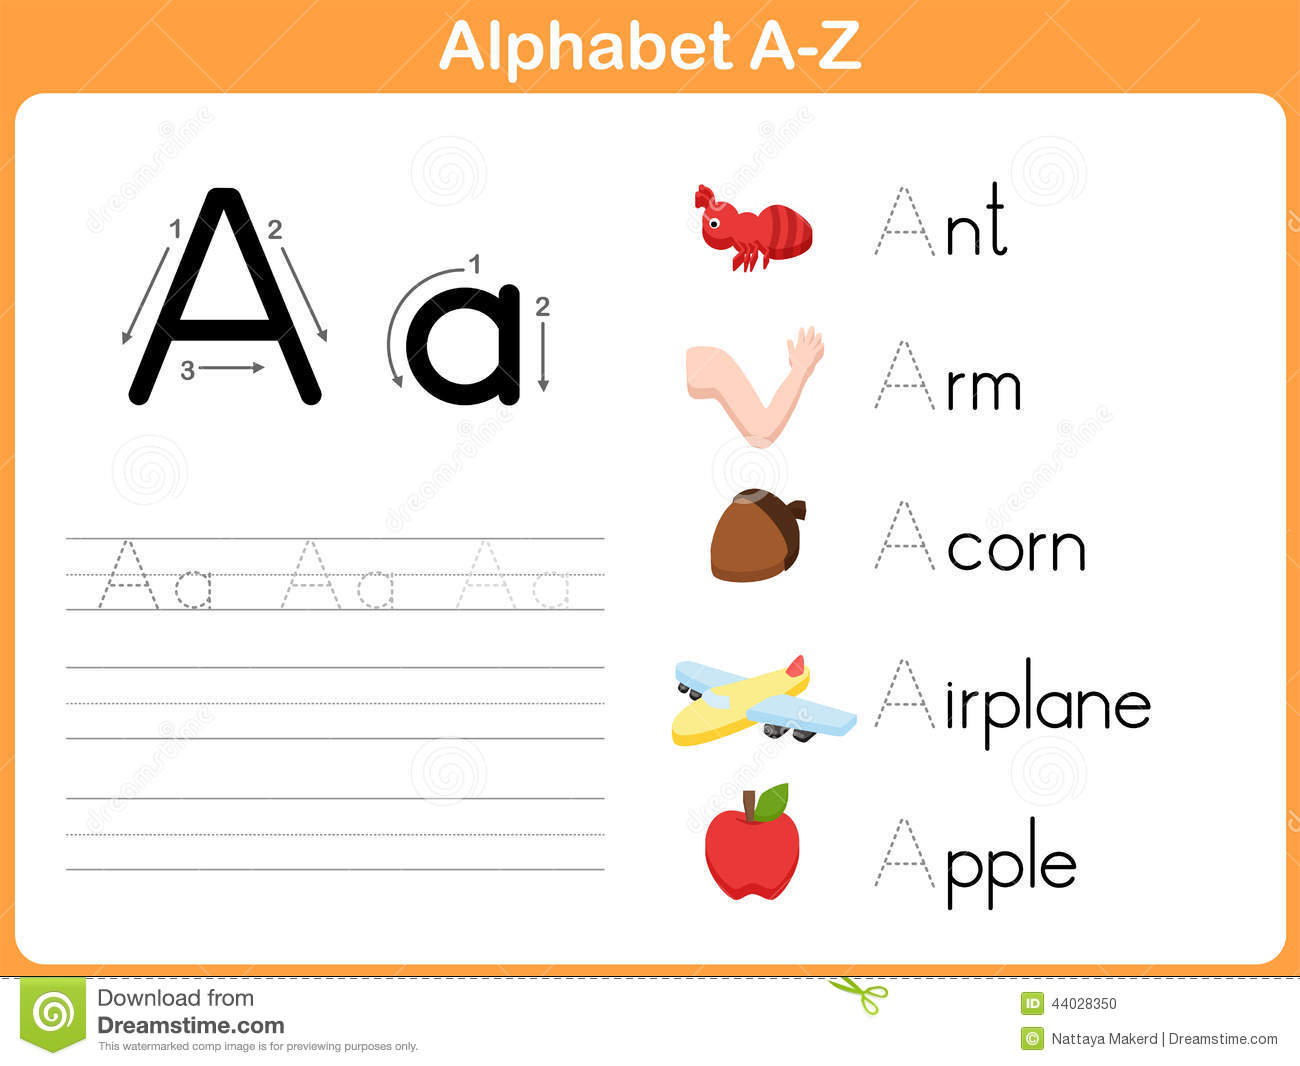 Alphabet Tracing Worksheet Stock Vector. Illustration Of in Alphabet Worksheets A-Z Free